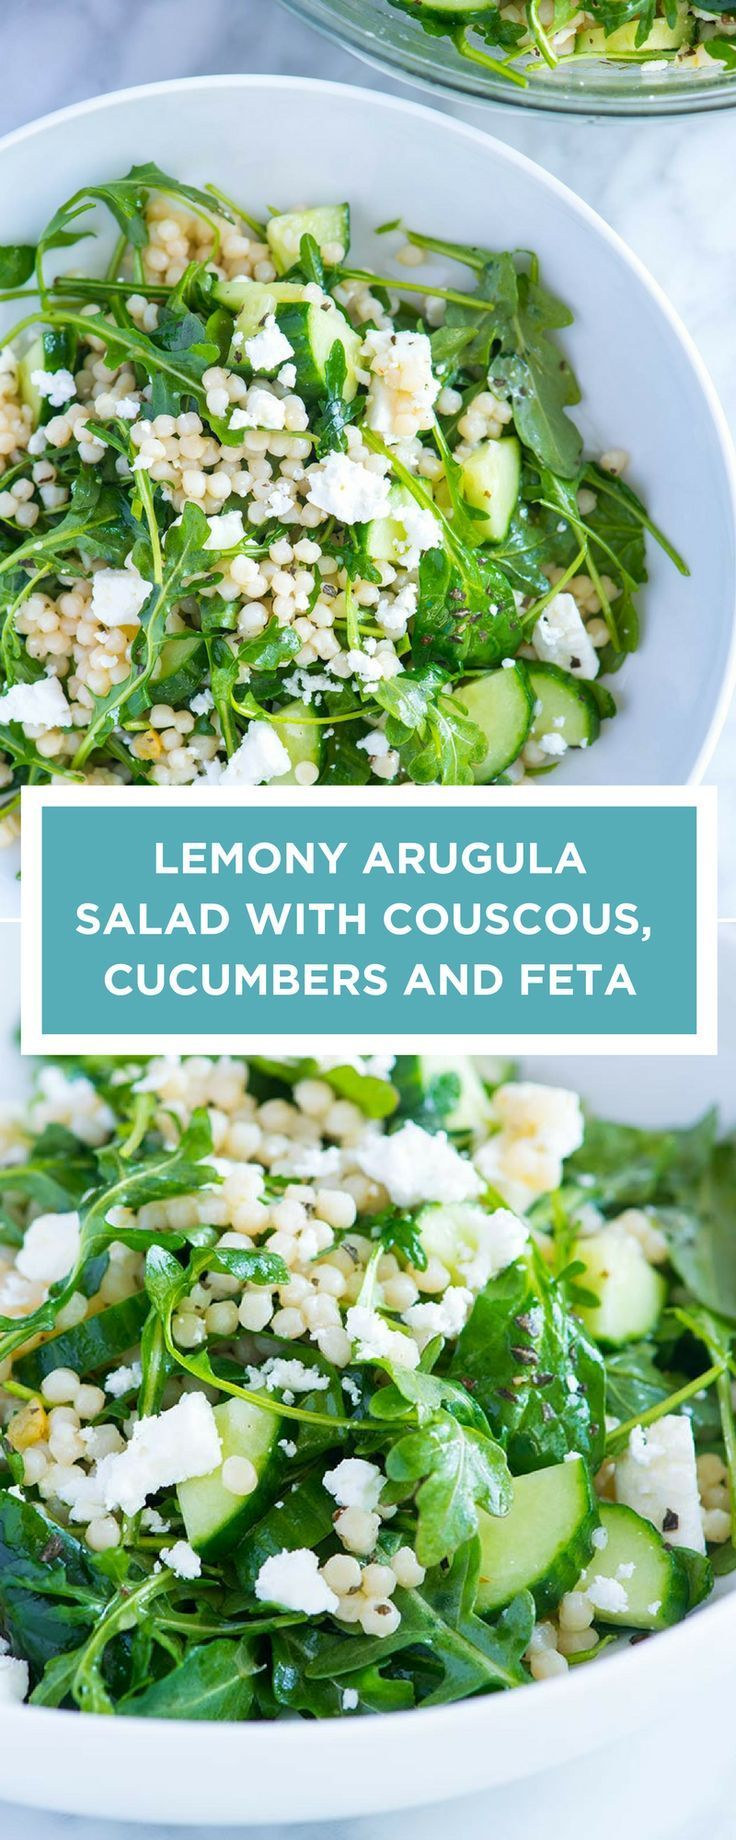 Photo of Lemony Arugula Salad with Couscous, Cucumbers and Feta